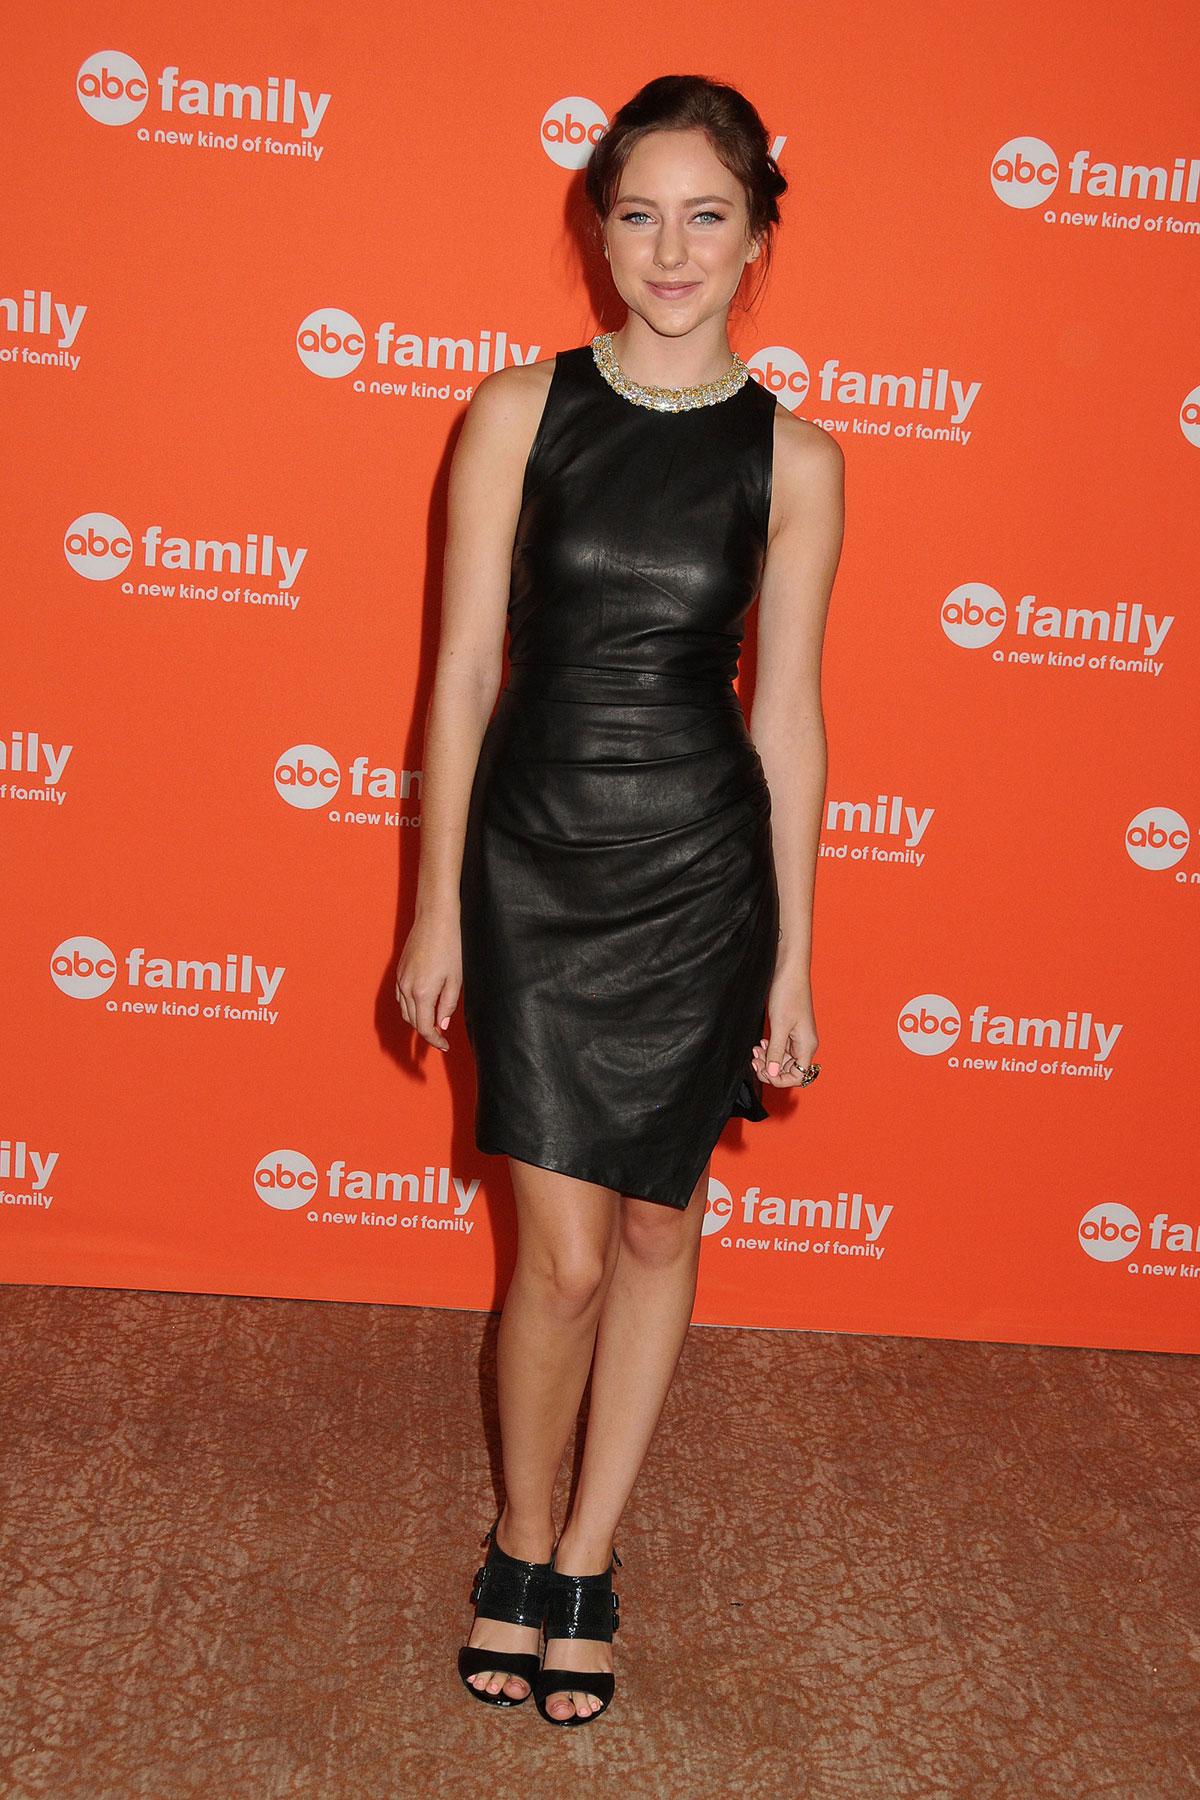 Haley Ramm attends Disney ABC TCA Summer Press Tour